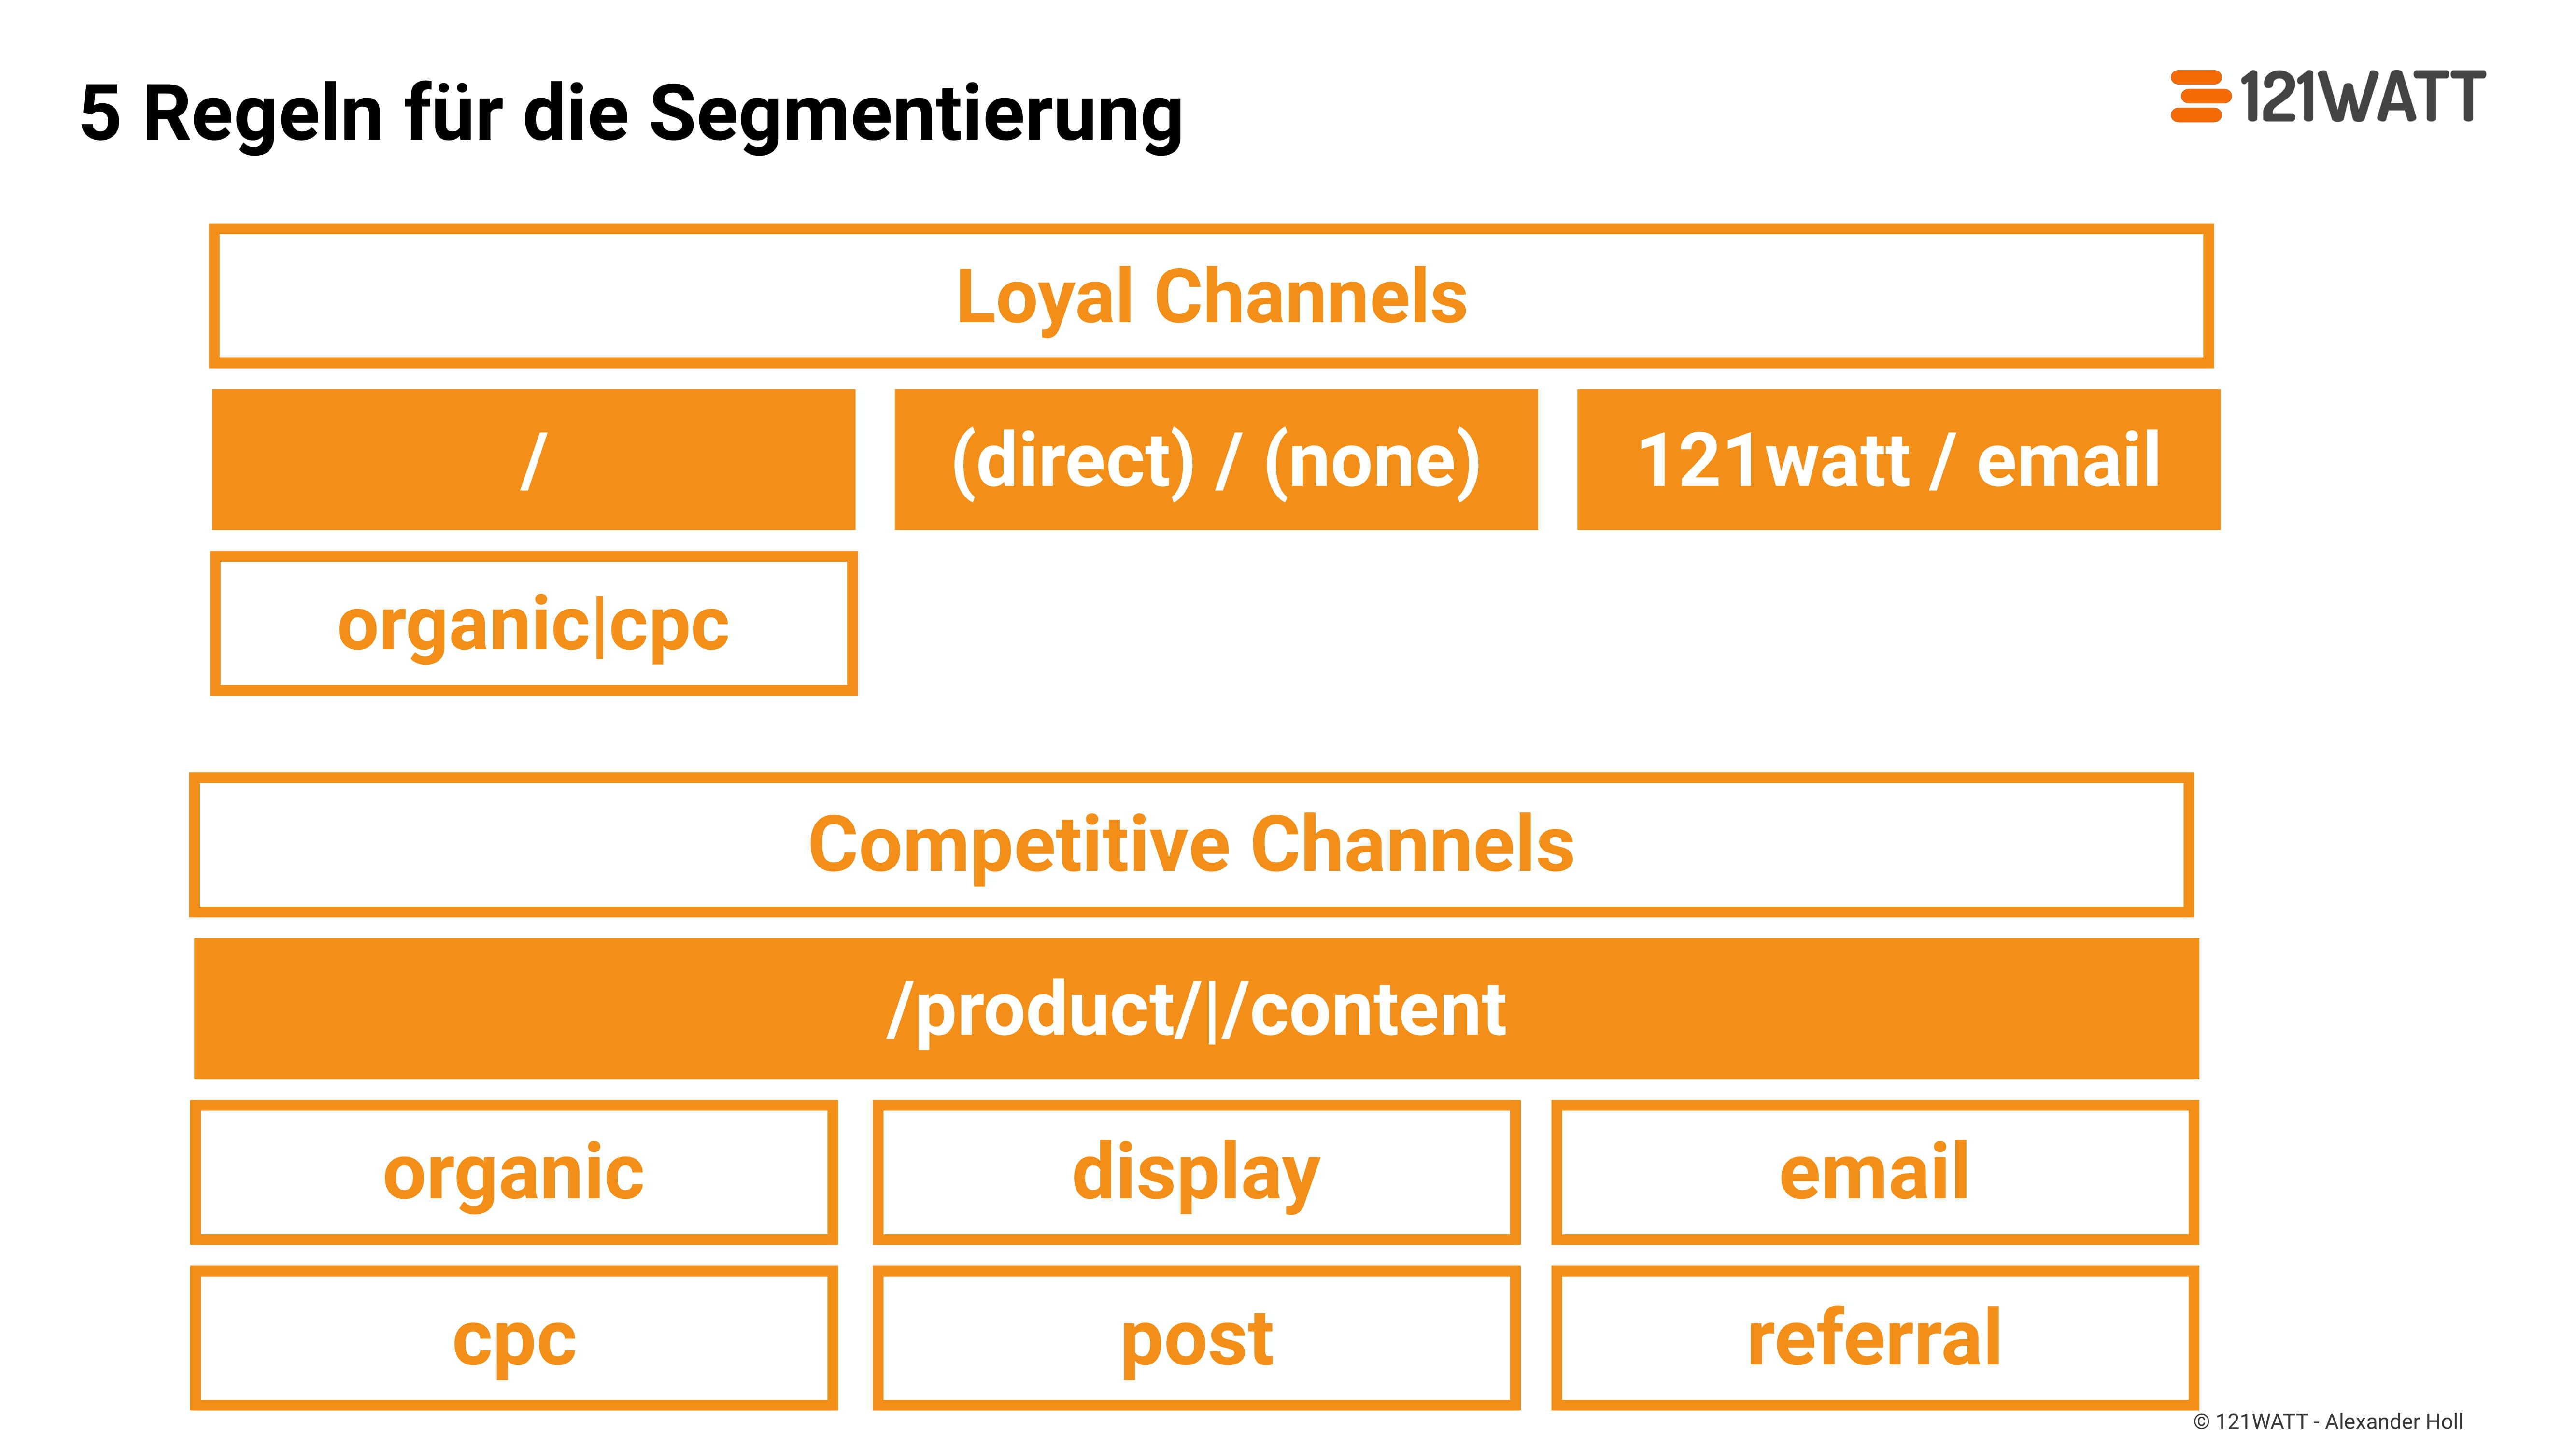 google-analytics-fortgeschrittene-segmentierungsstrategien-seo-day-short-version2-52.jpg